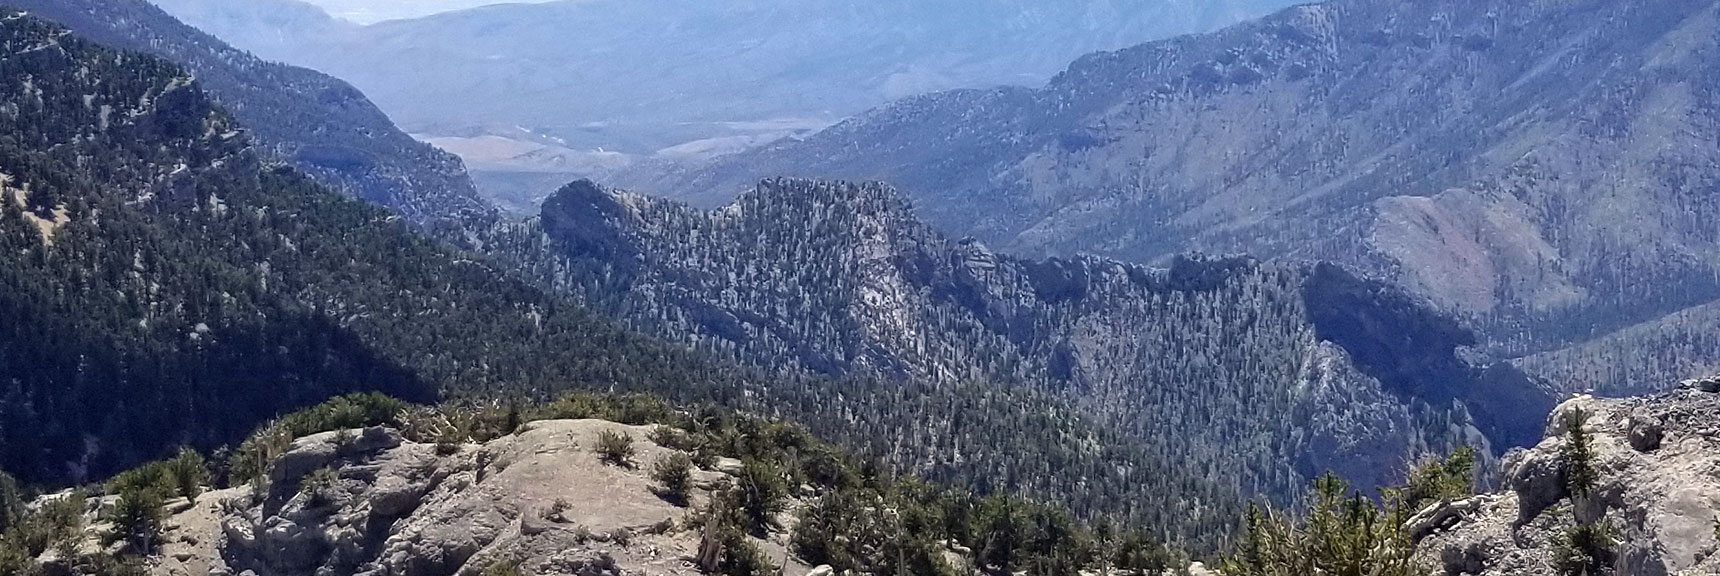 Cockscomb Peak and Ridge Viewed from Lee Peak Summit in Mt Charleston Wilderness, Nevada